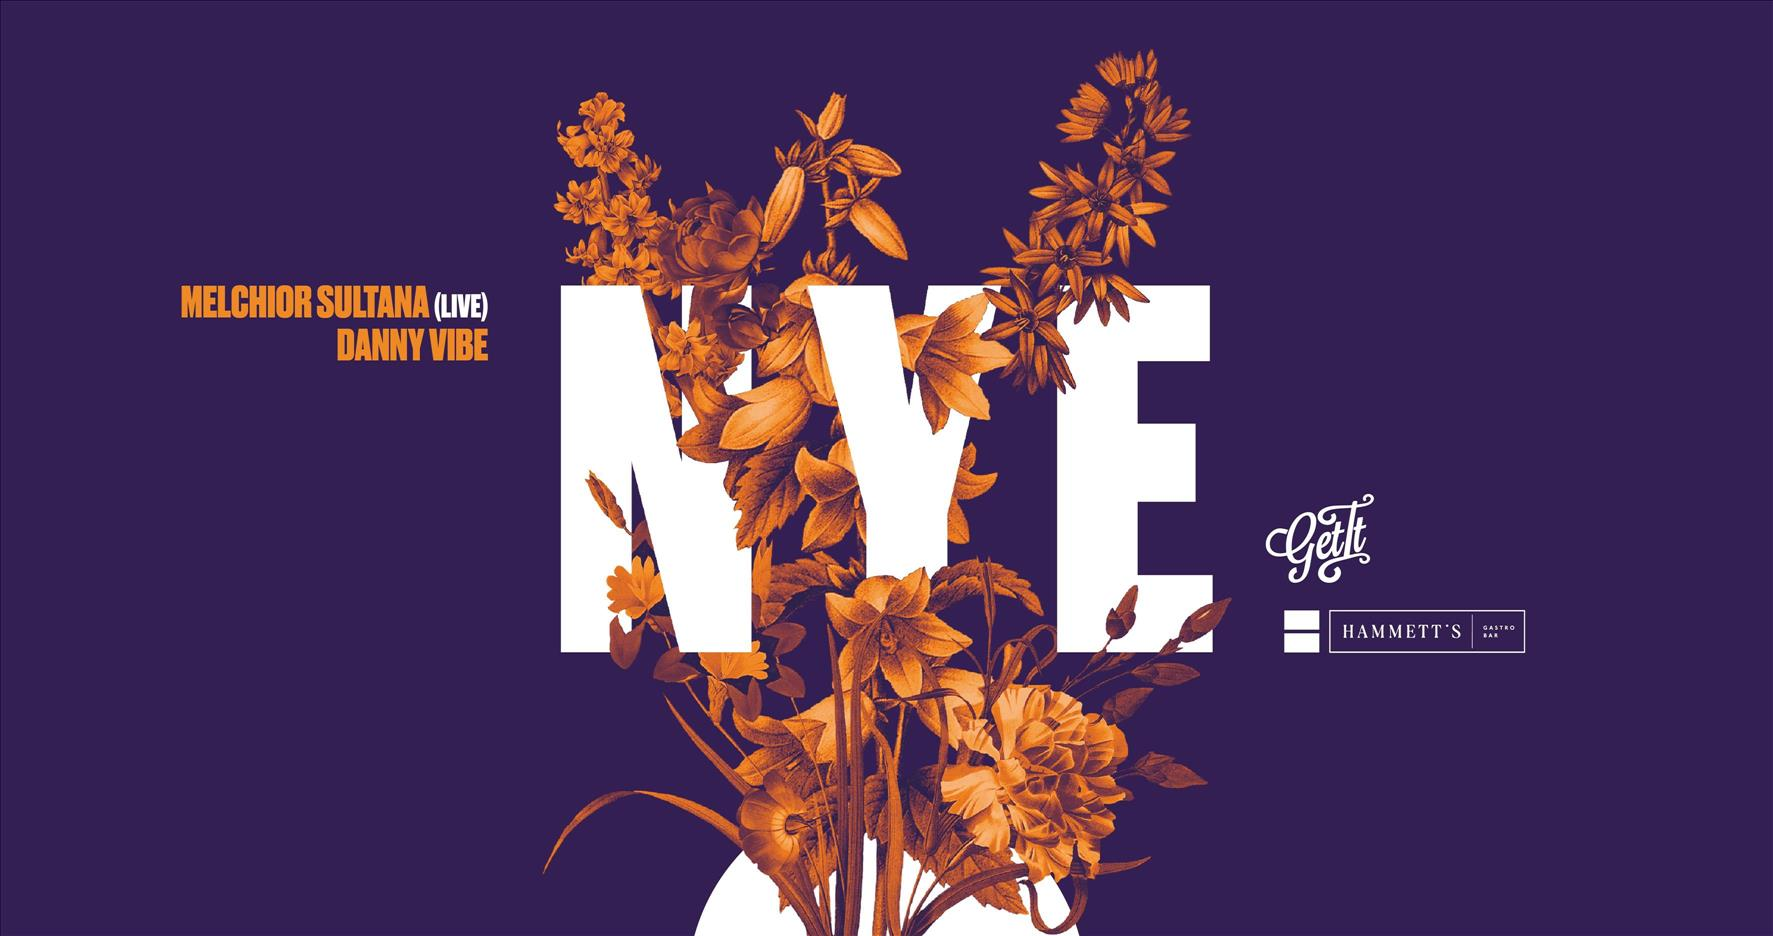 New Year's Eve at Hammett's flyer